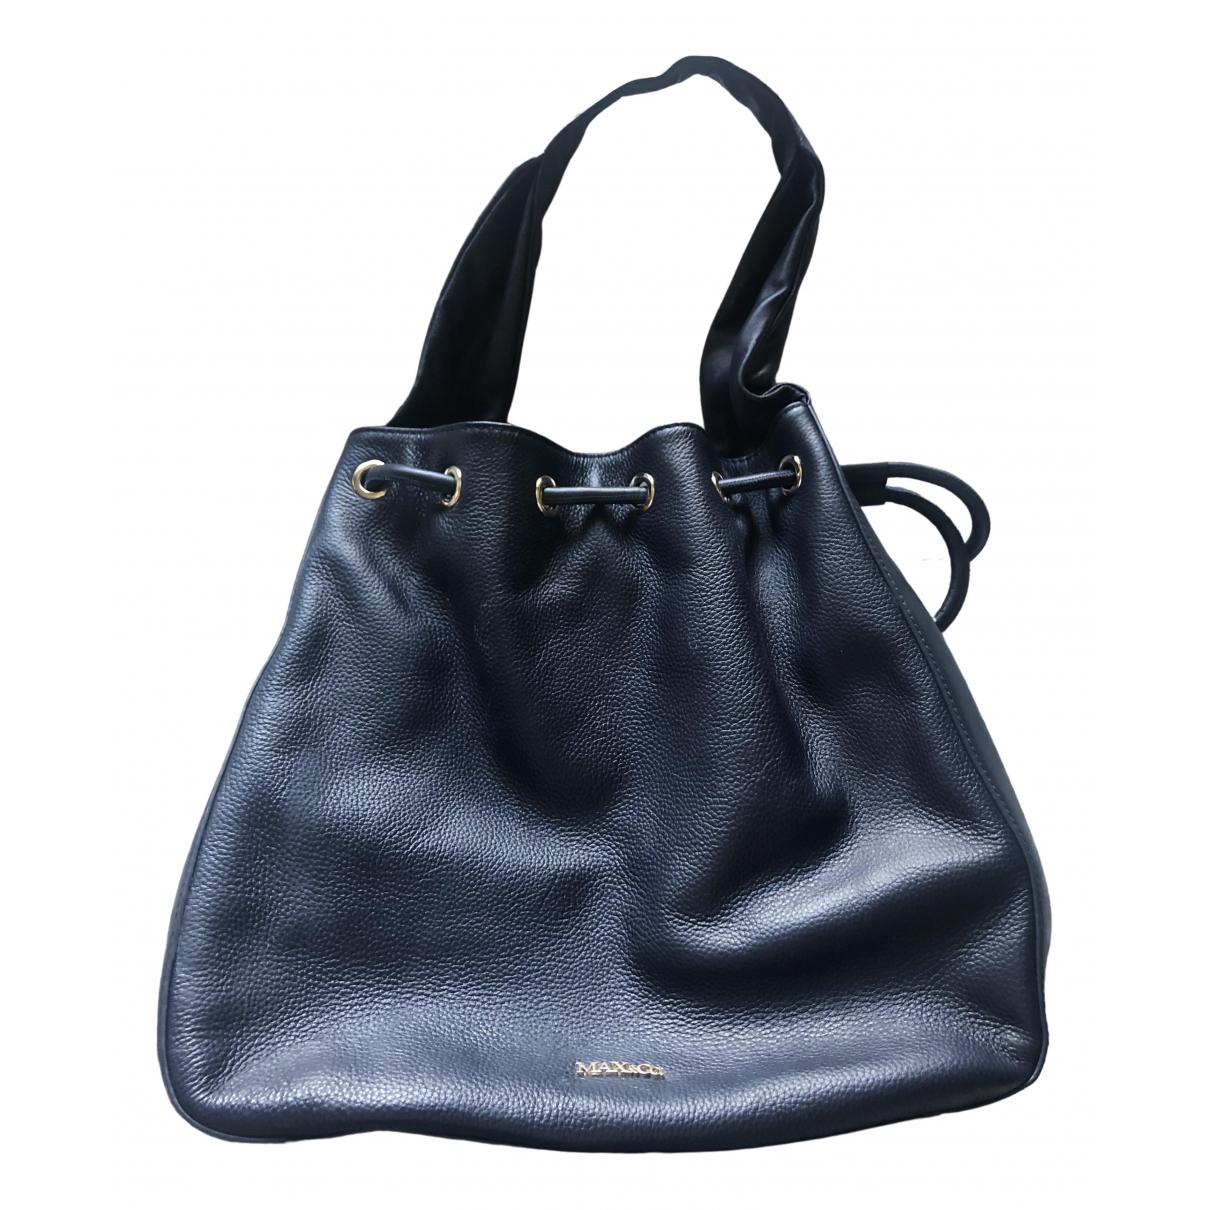 Max & Co \N Navy Leather handbag for Women \N